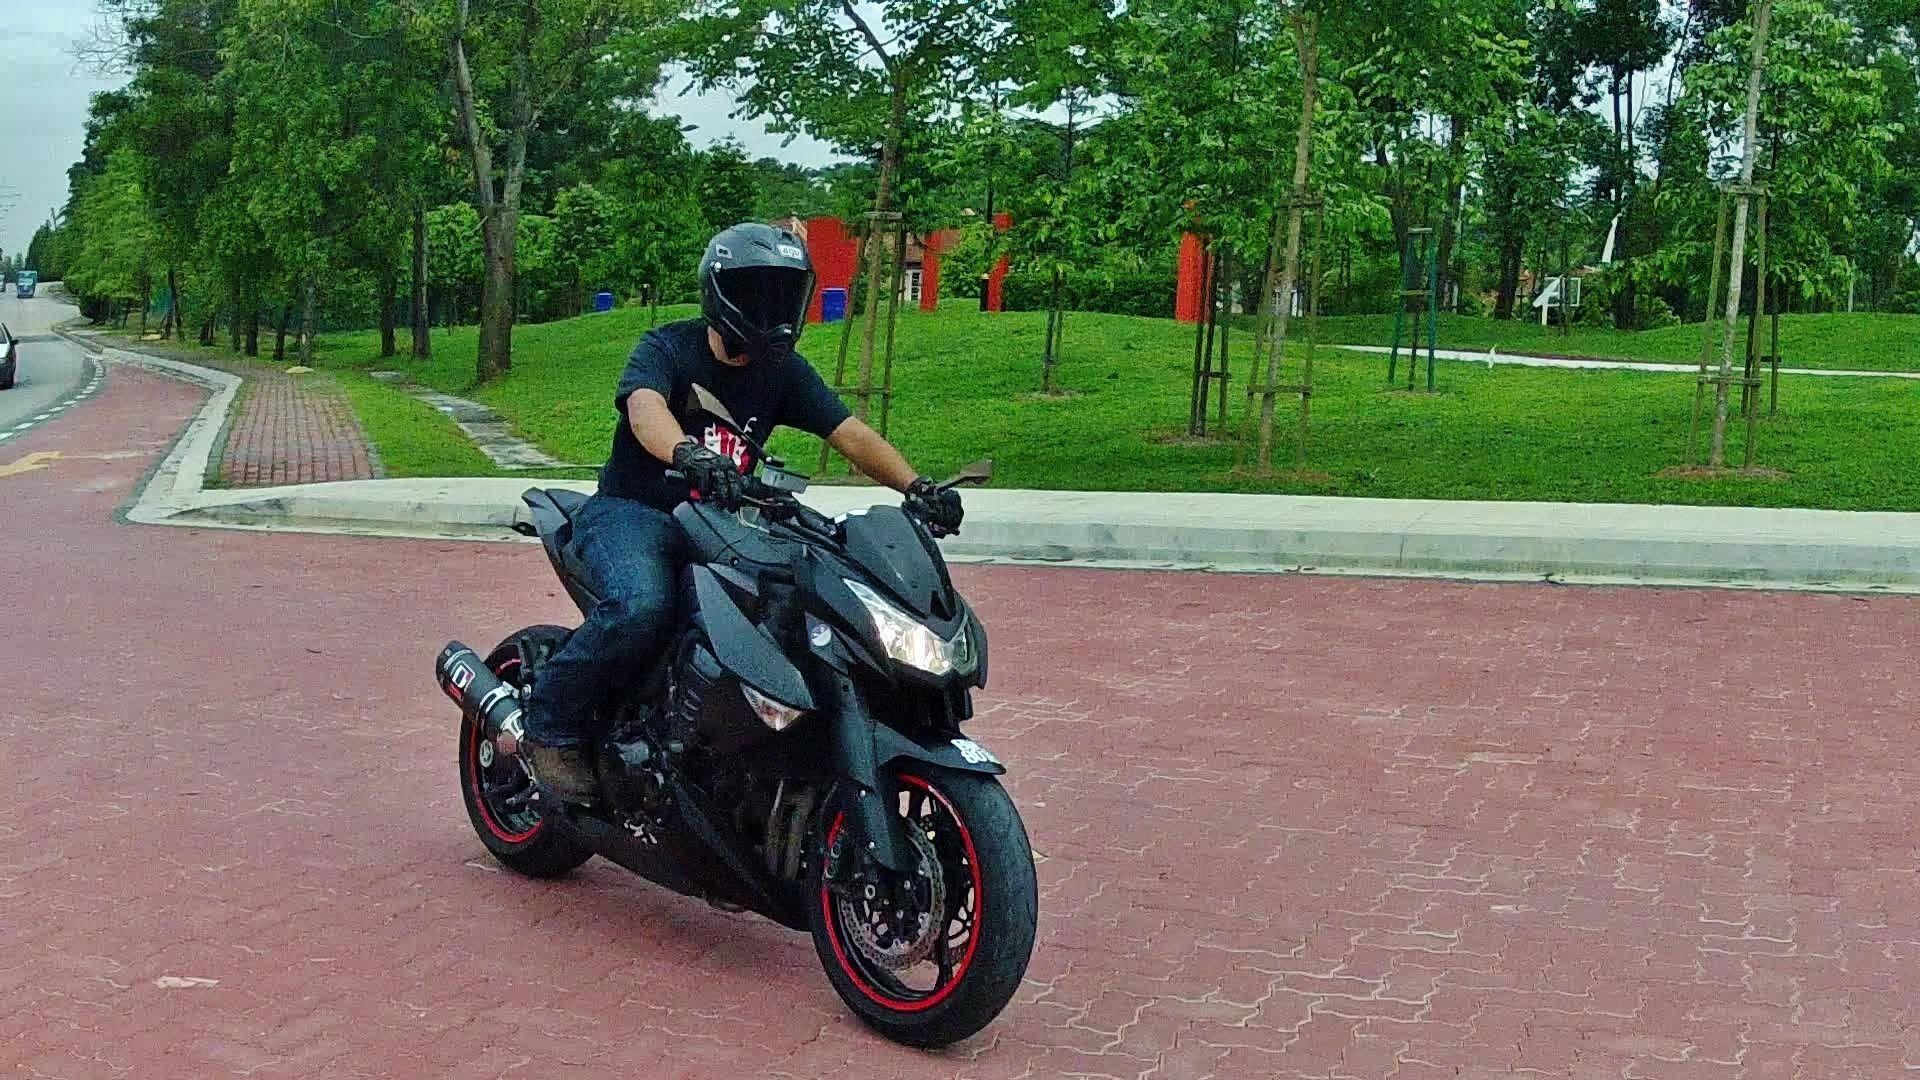 Kawasaki Ninja Z1000 Street Fighter